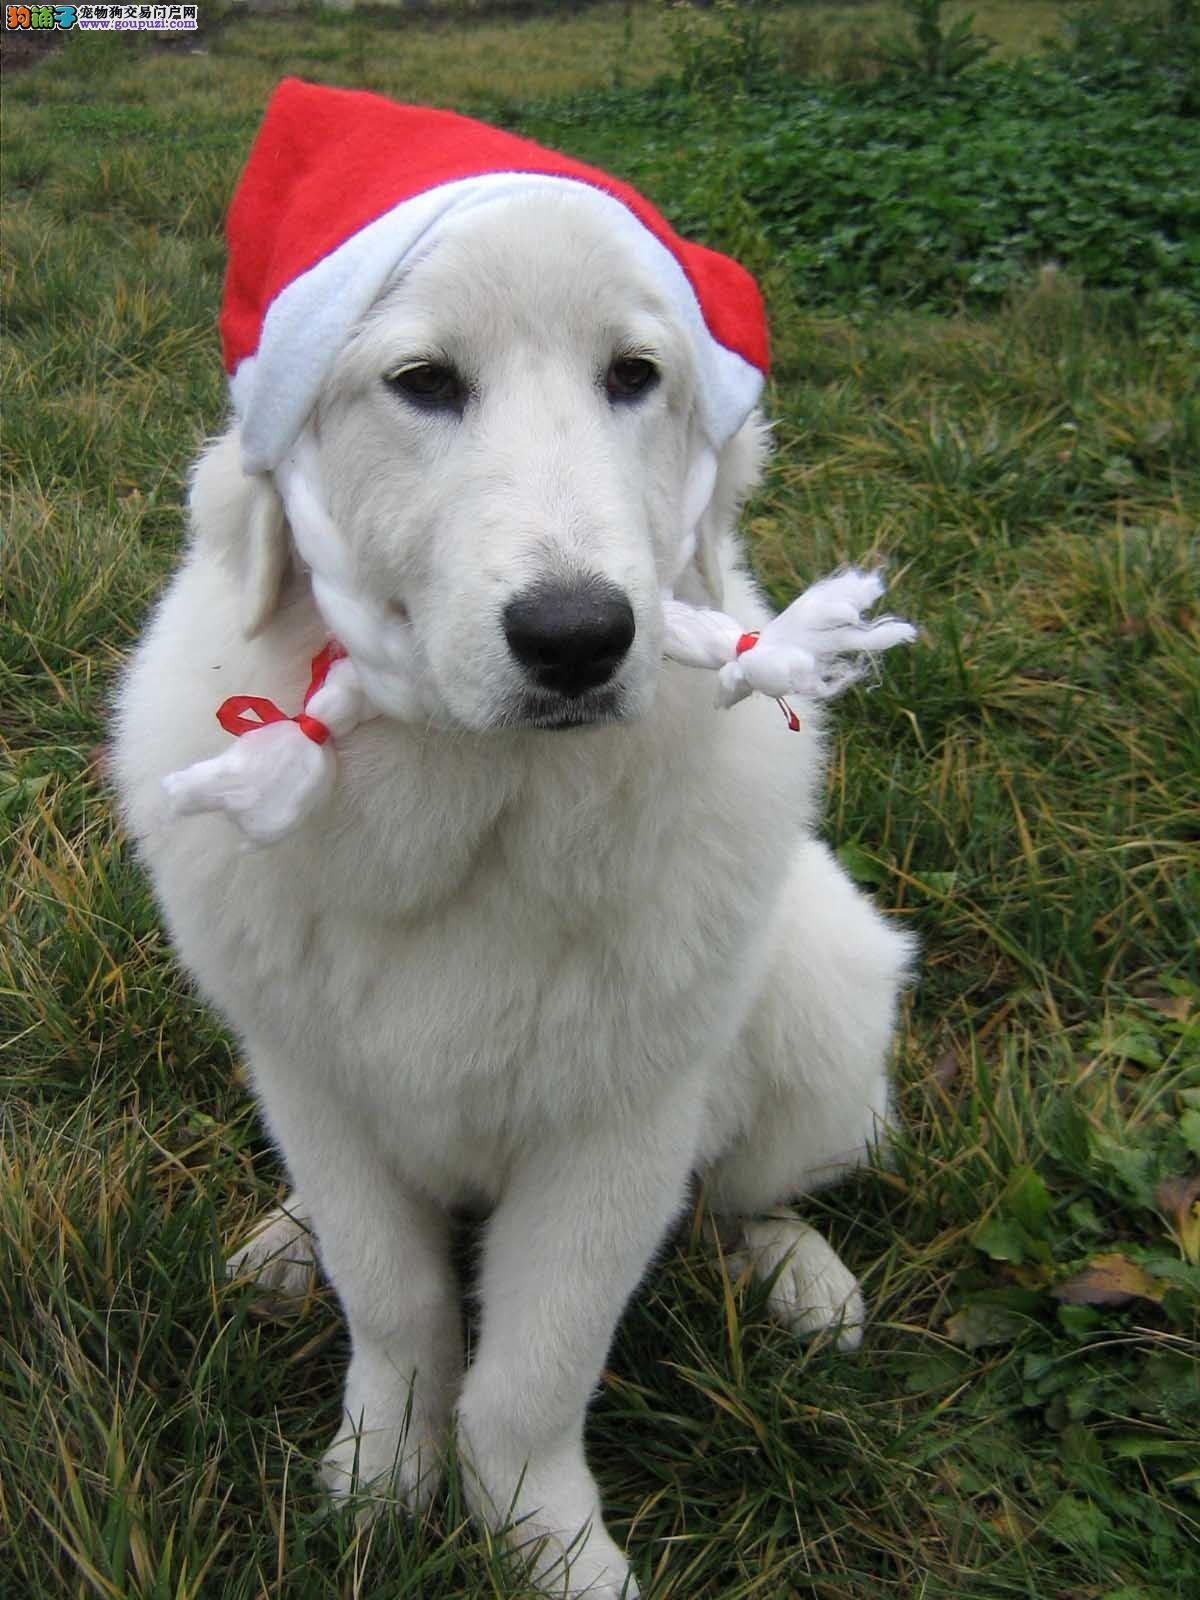 AKC认证专业繁殖赛级纯种大白熊幼犬签订质保协议图片